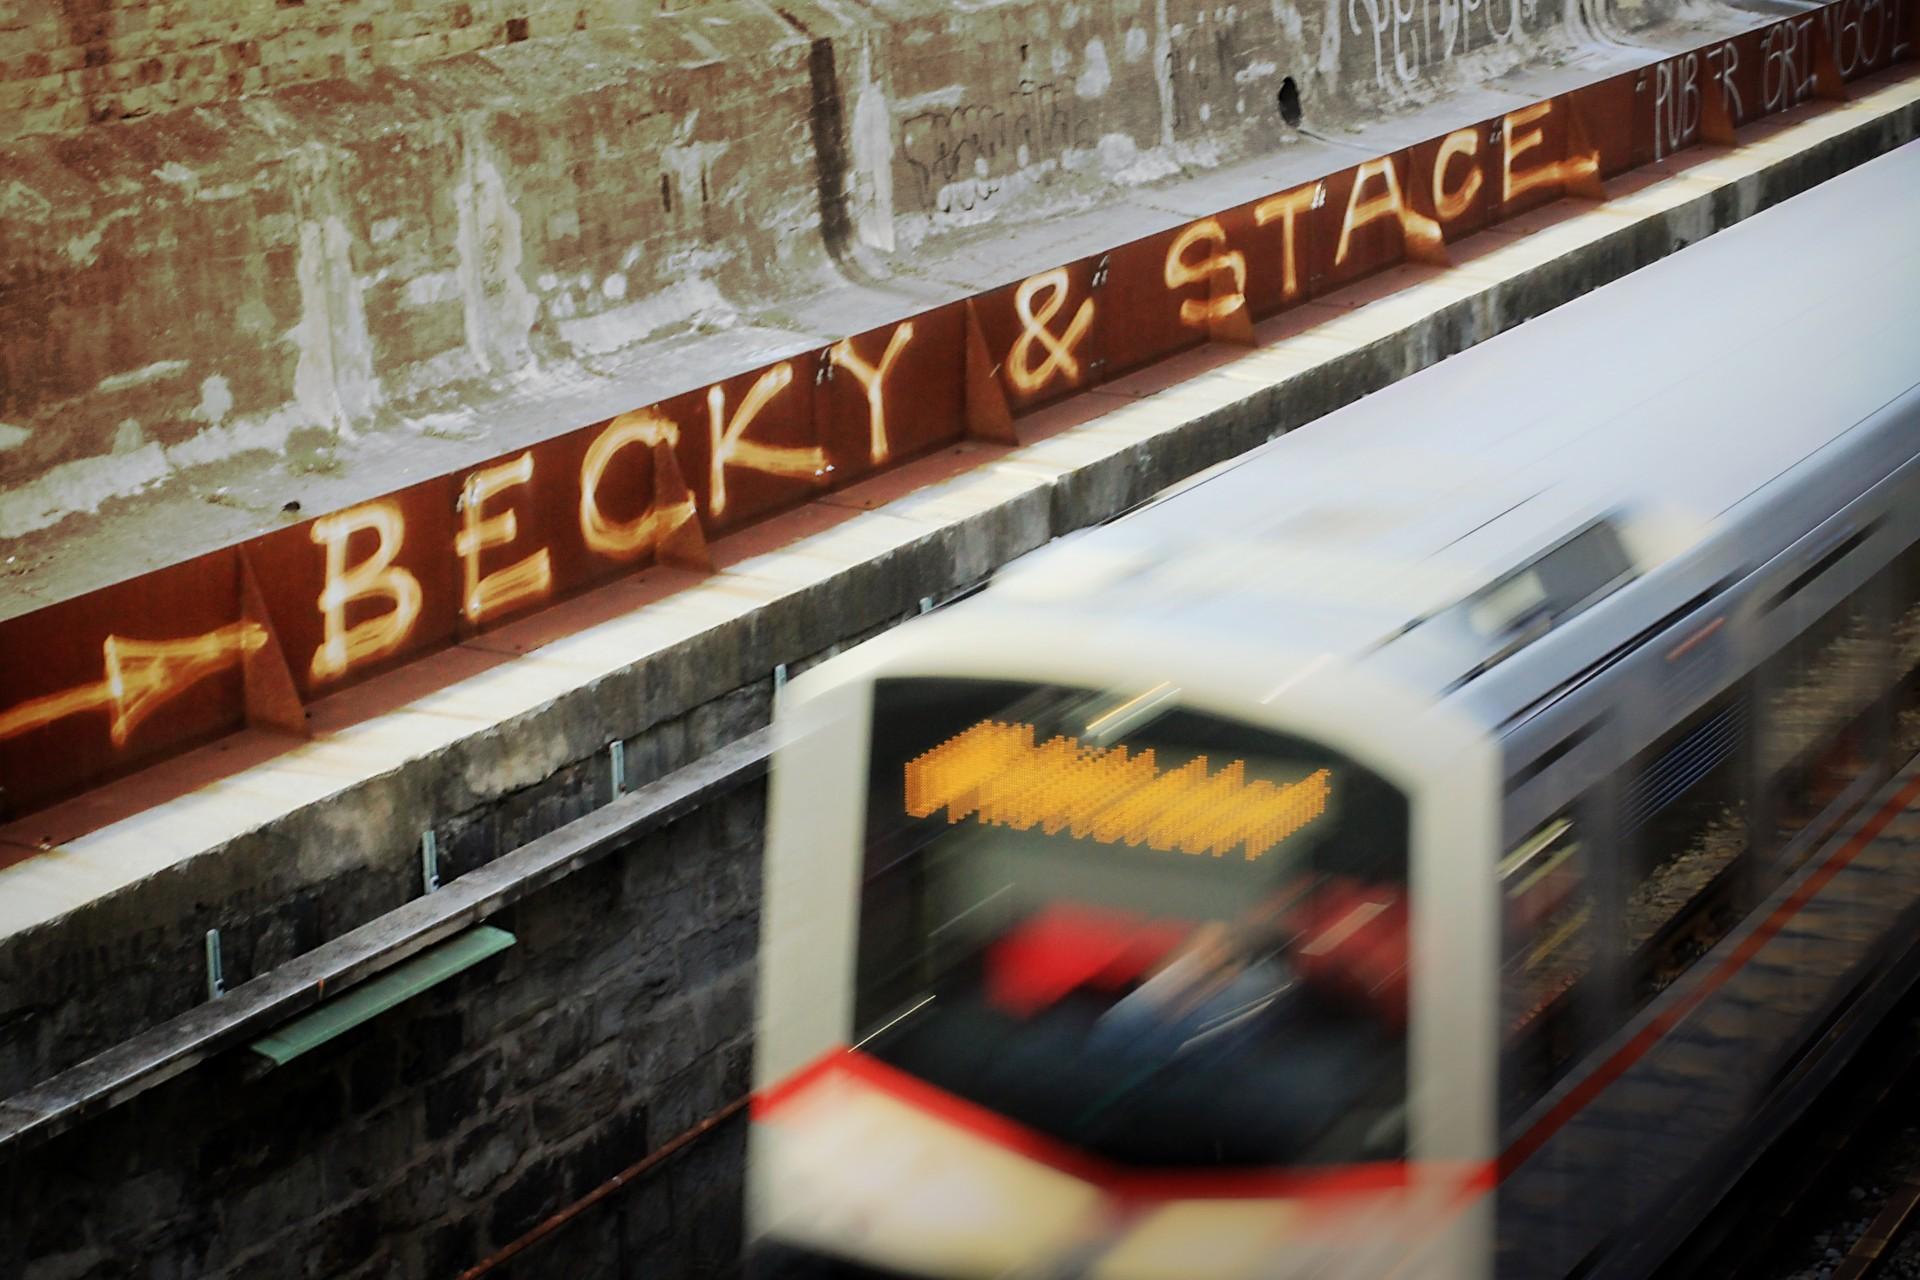 u4-becky